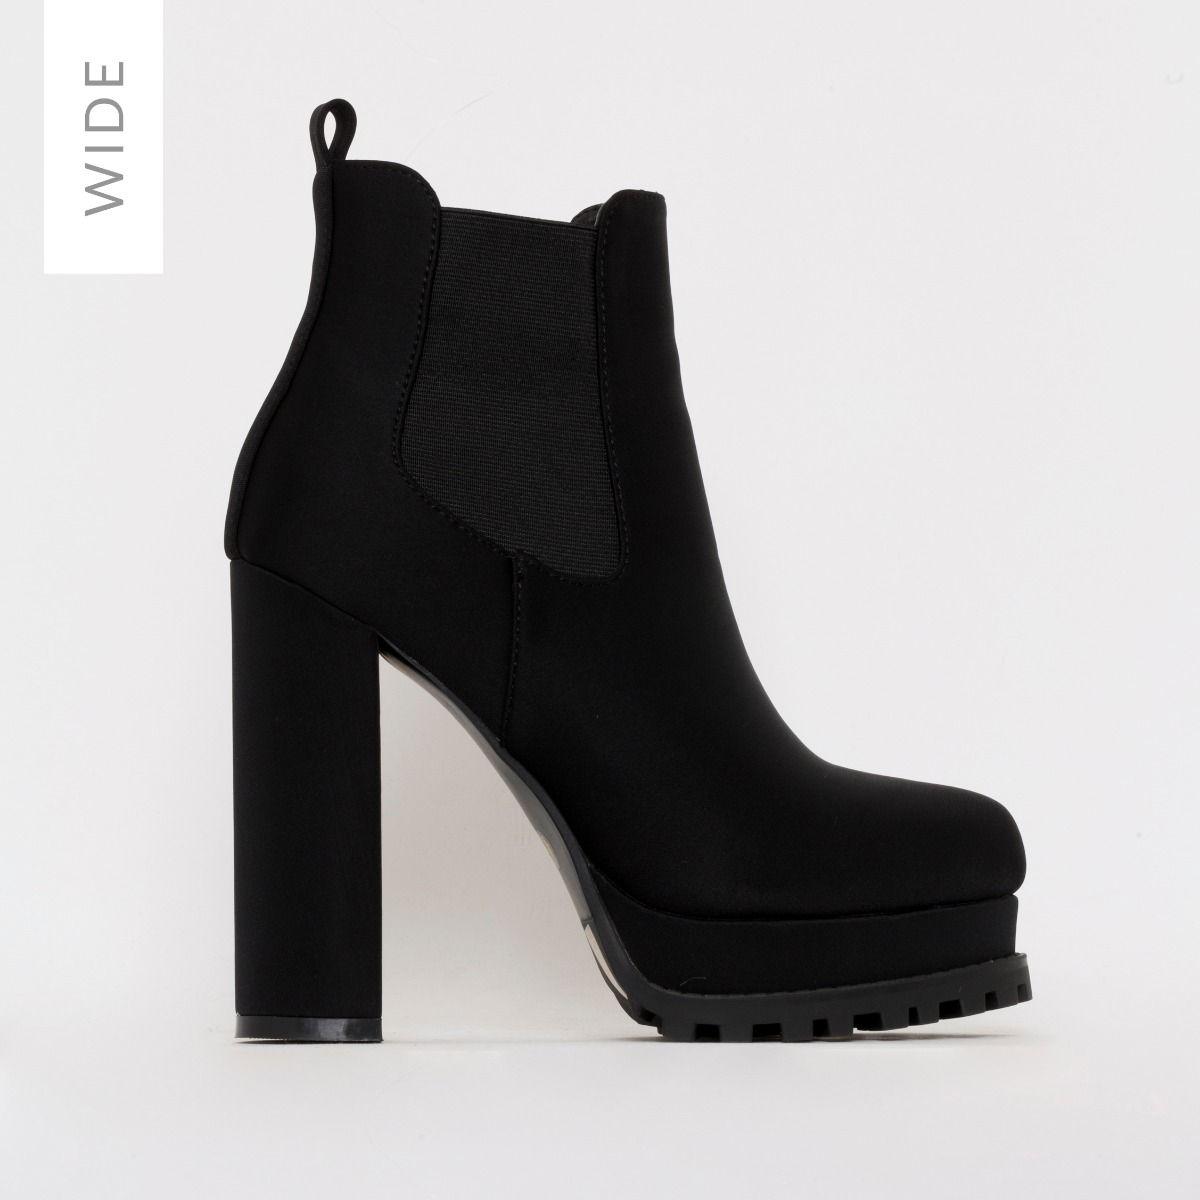 wide fit platform ankle boots